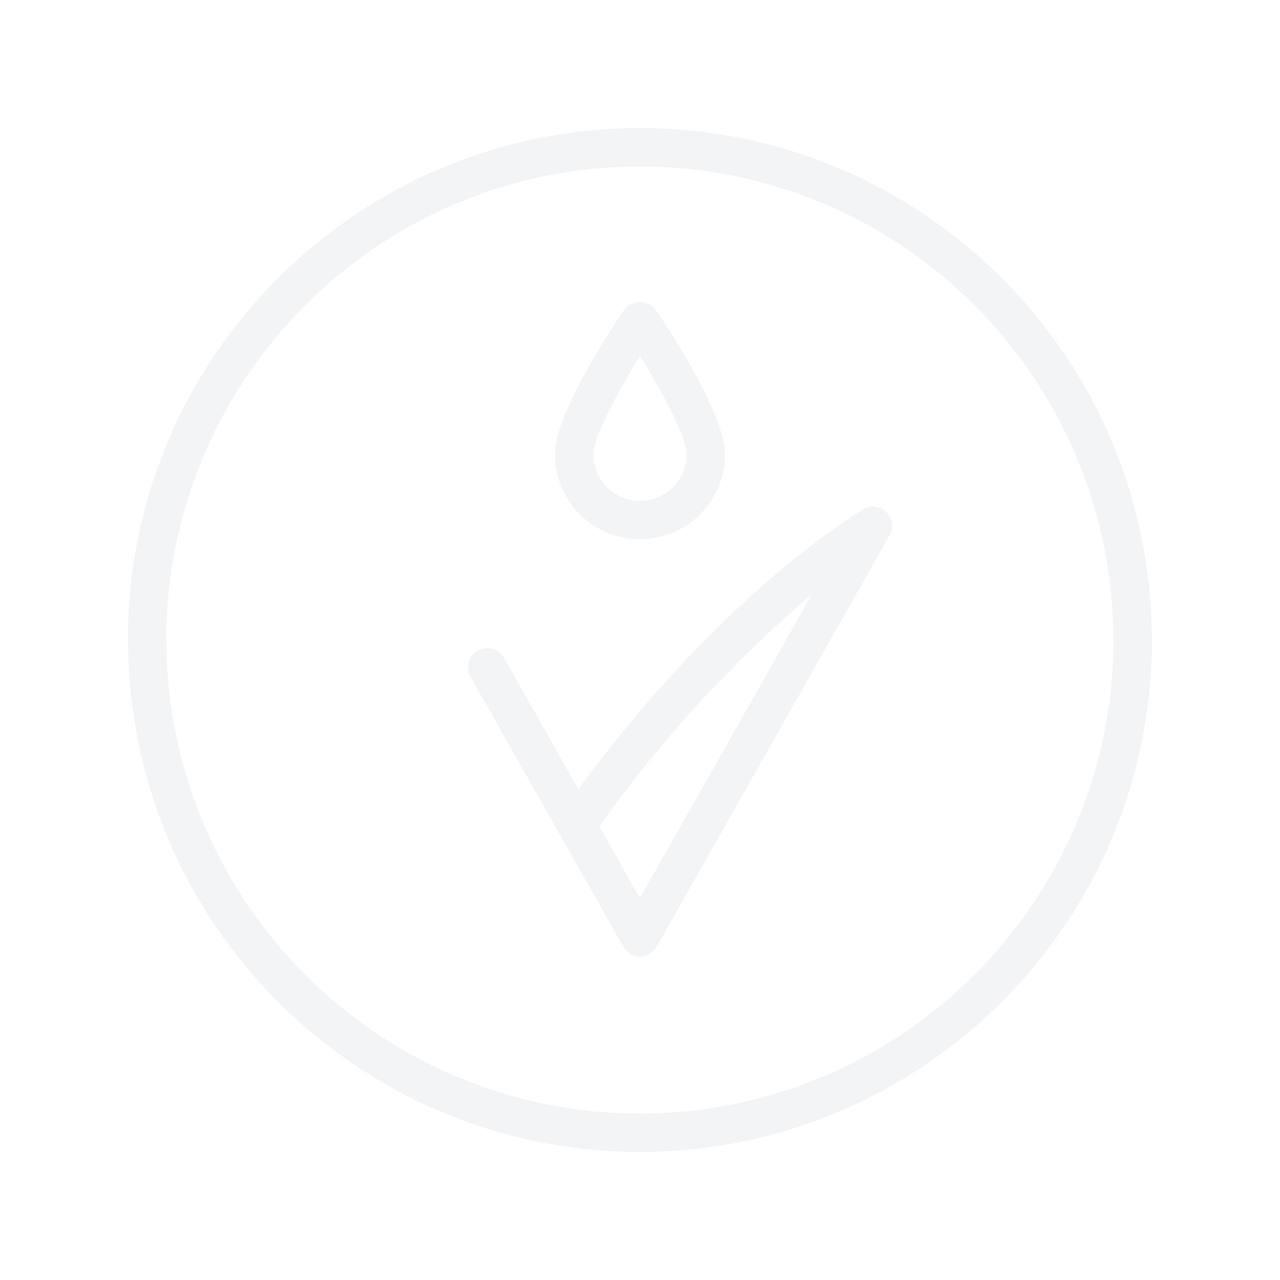 HUGO BOSS The Scent For Her Intense Eau De Parfum